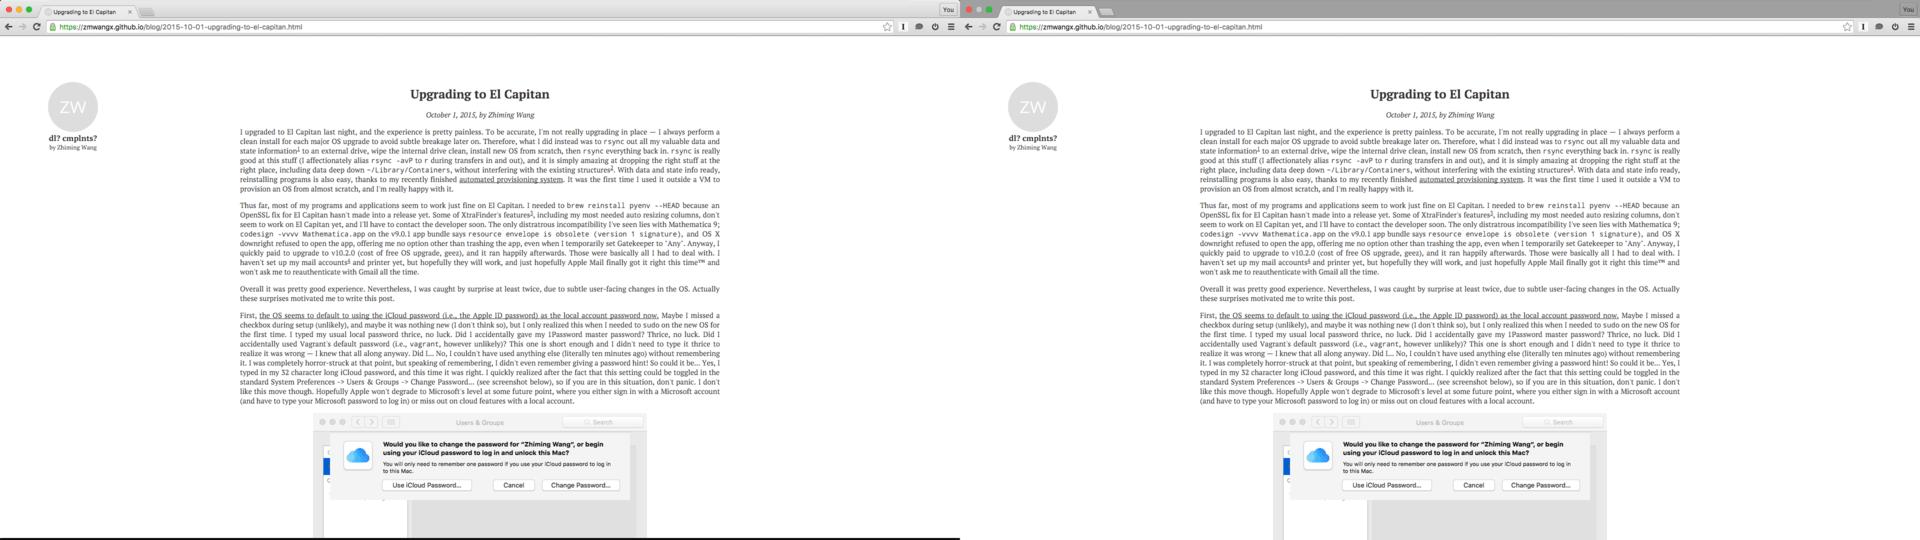 Auto hidden menu bar & dock + maximized window is the new full screen mode